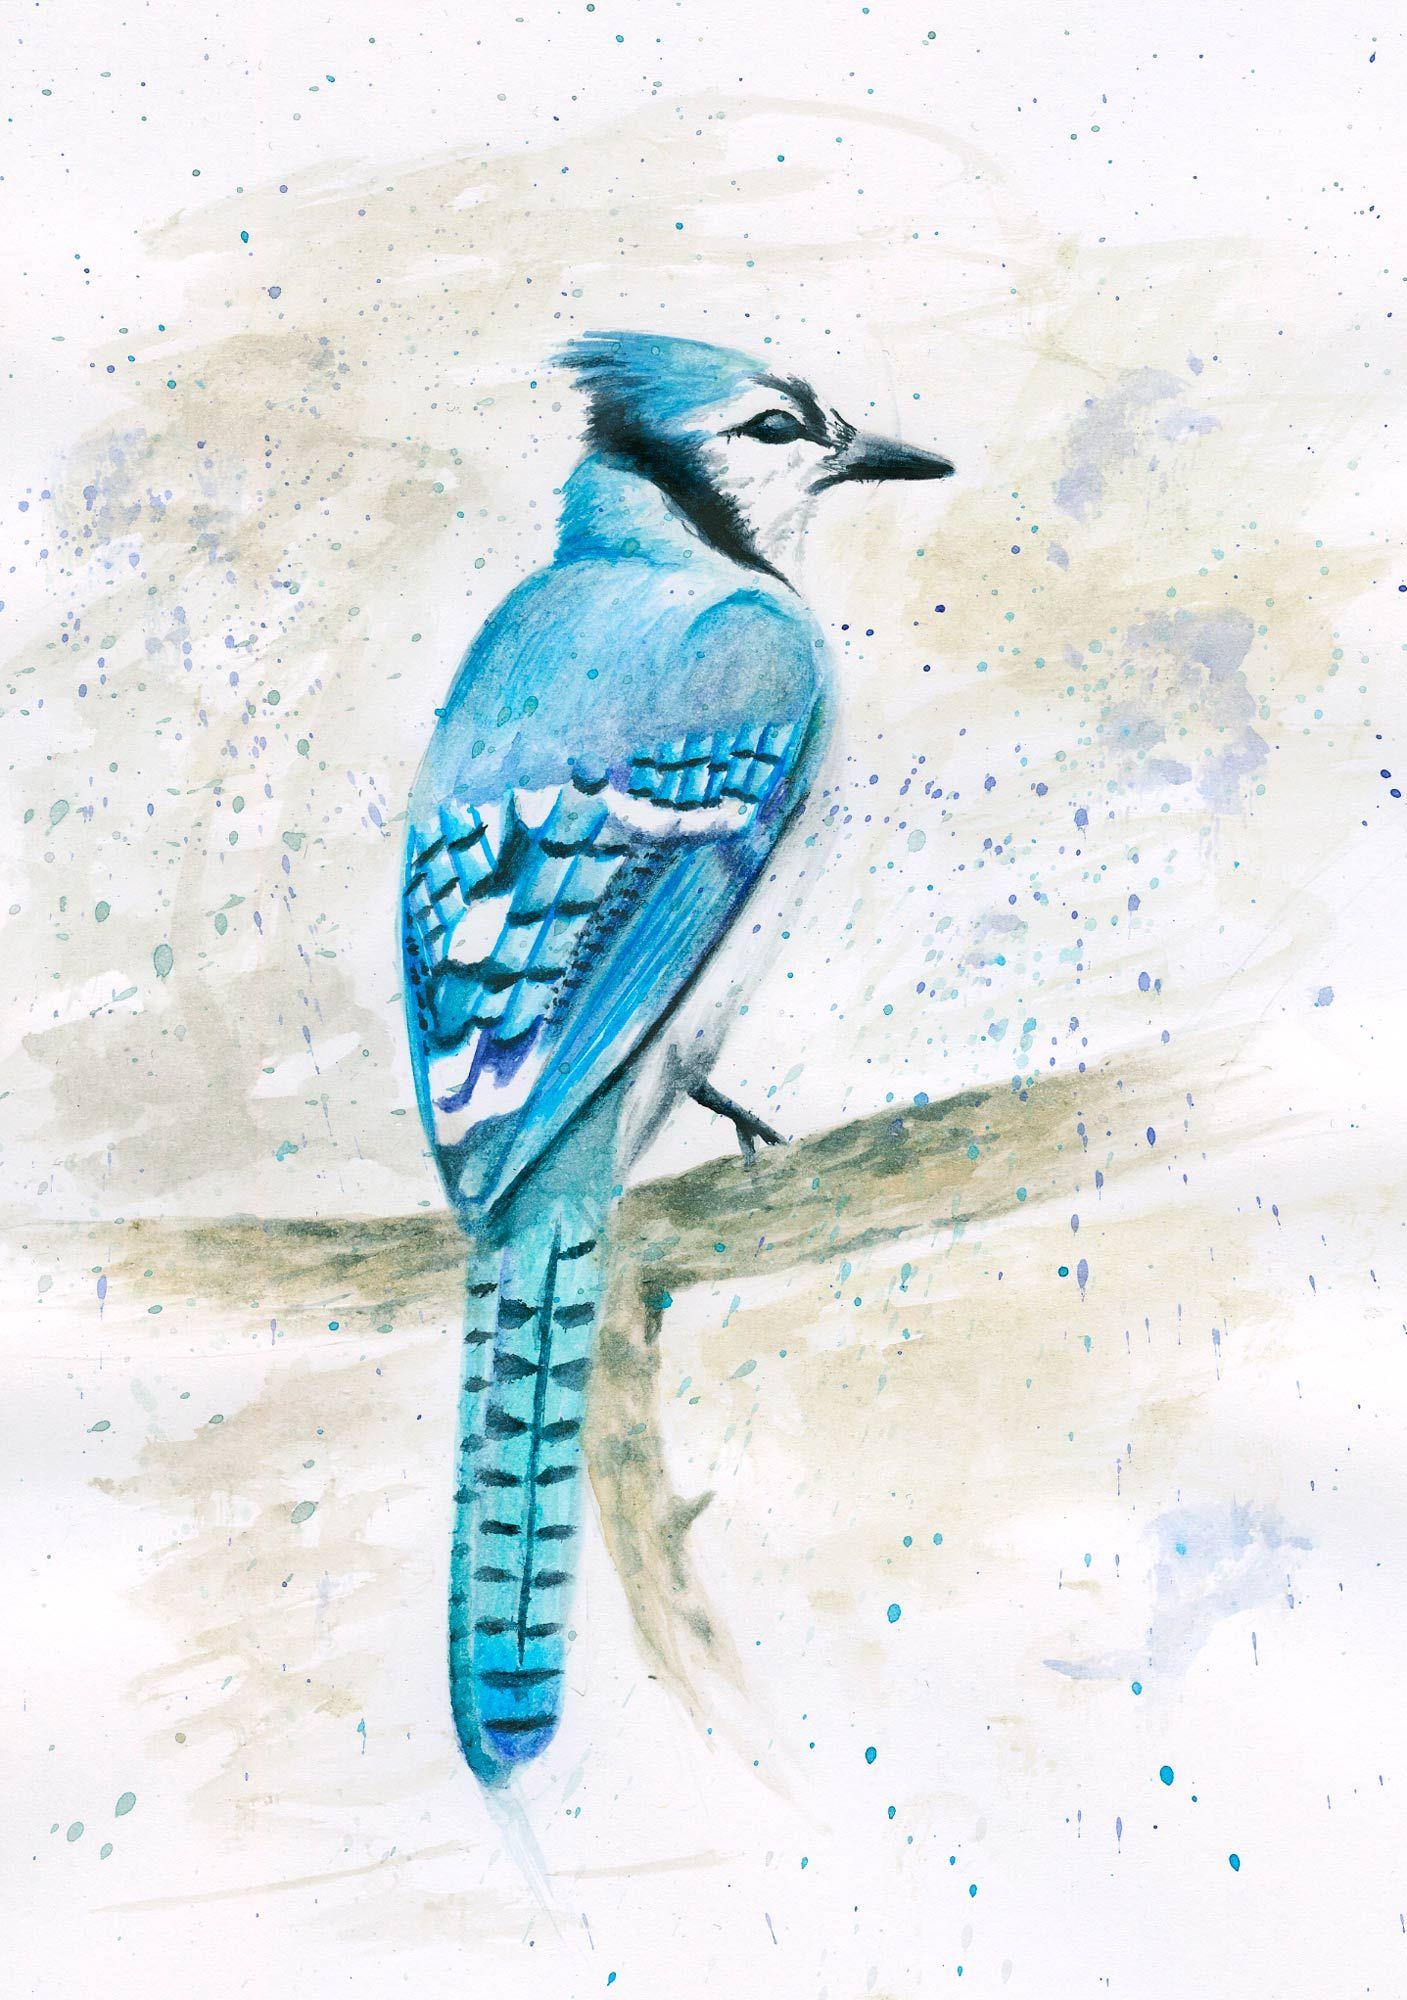 Eisvogel Aquarell Blau Tier Vogel Gemalt Eisvogel Aquarell